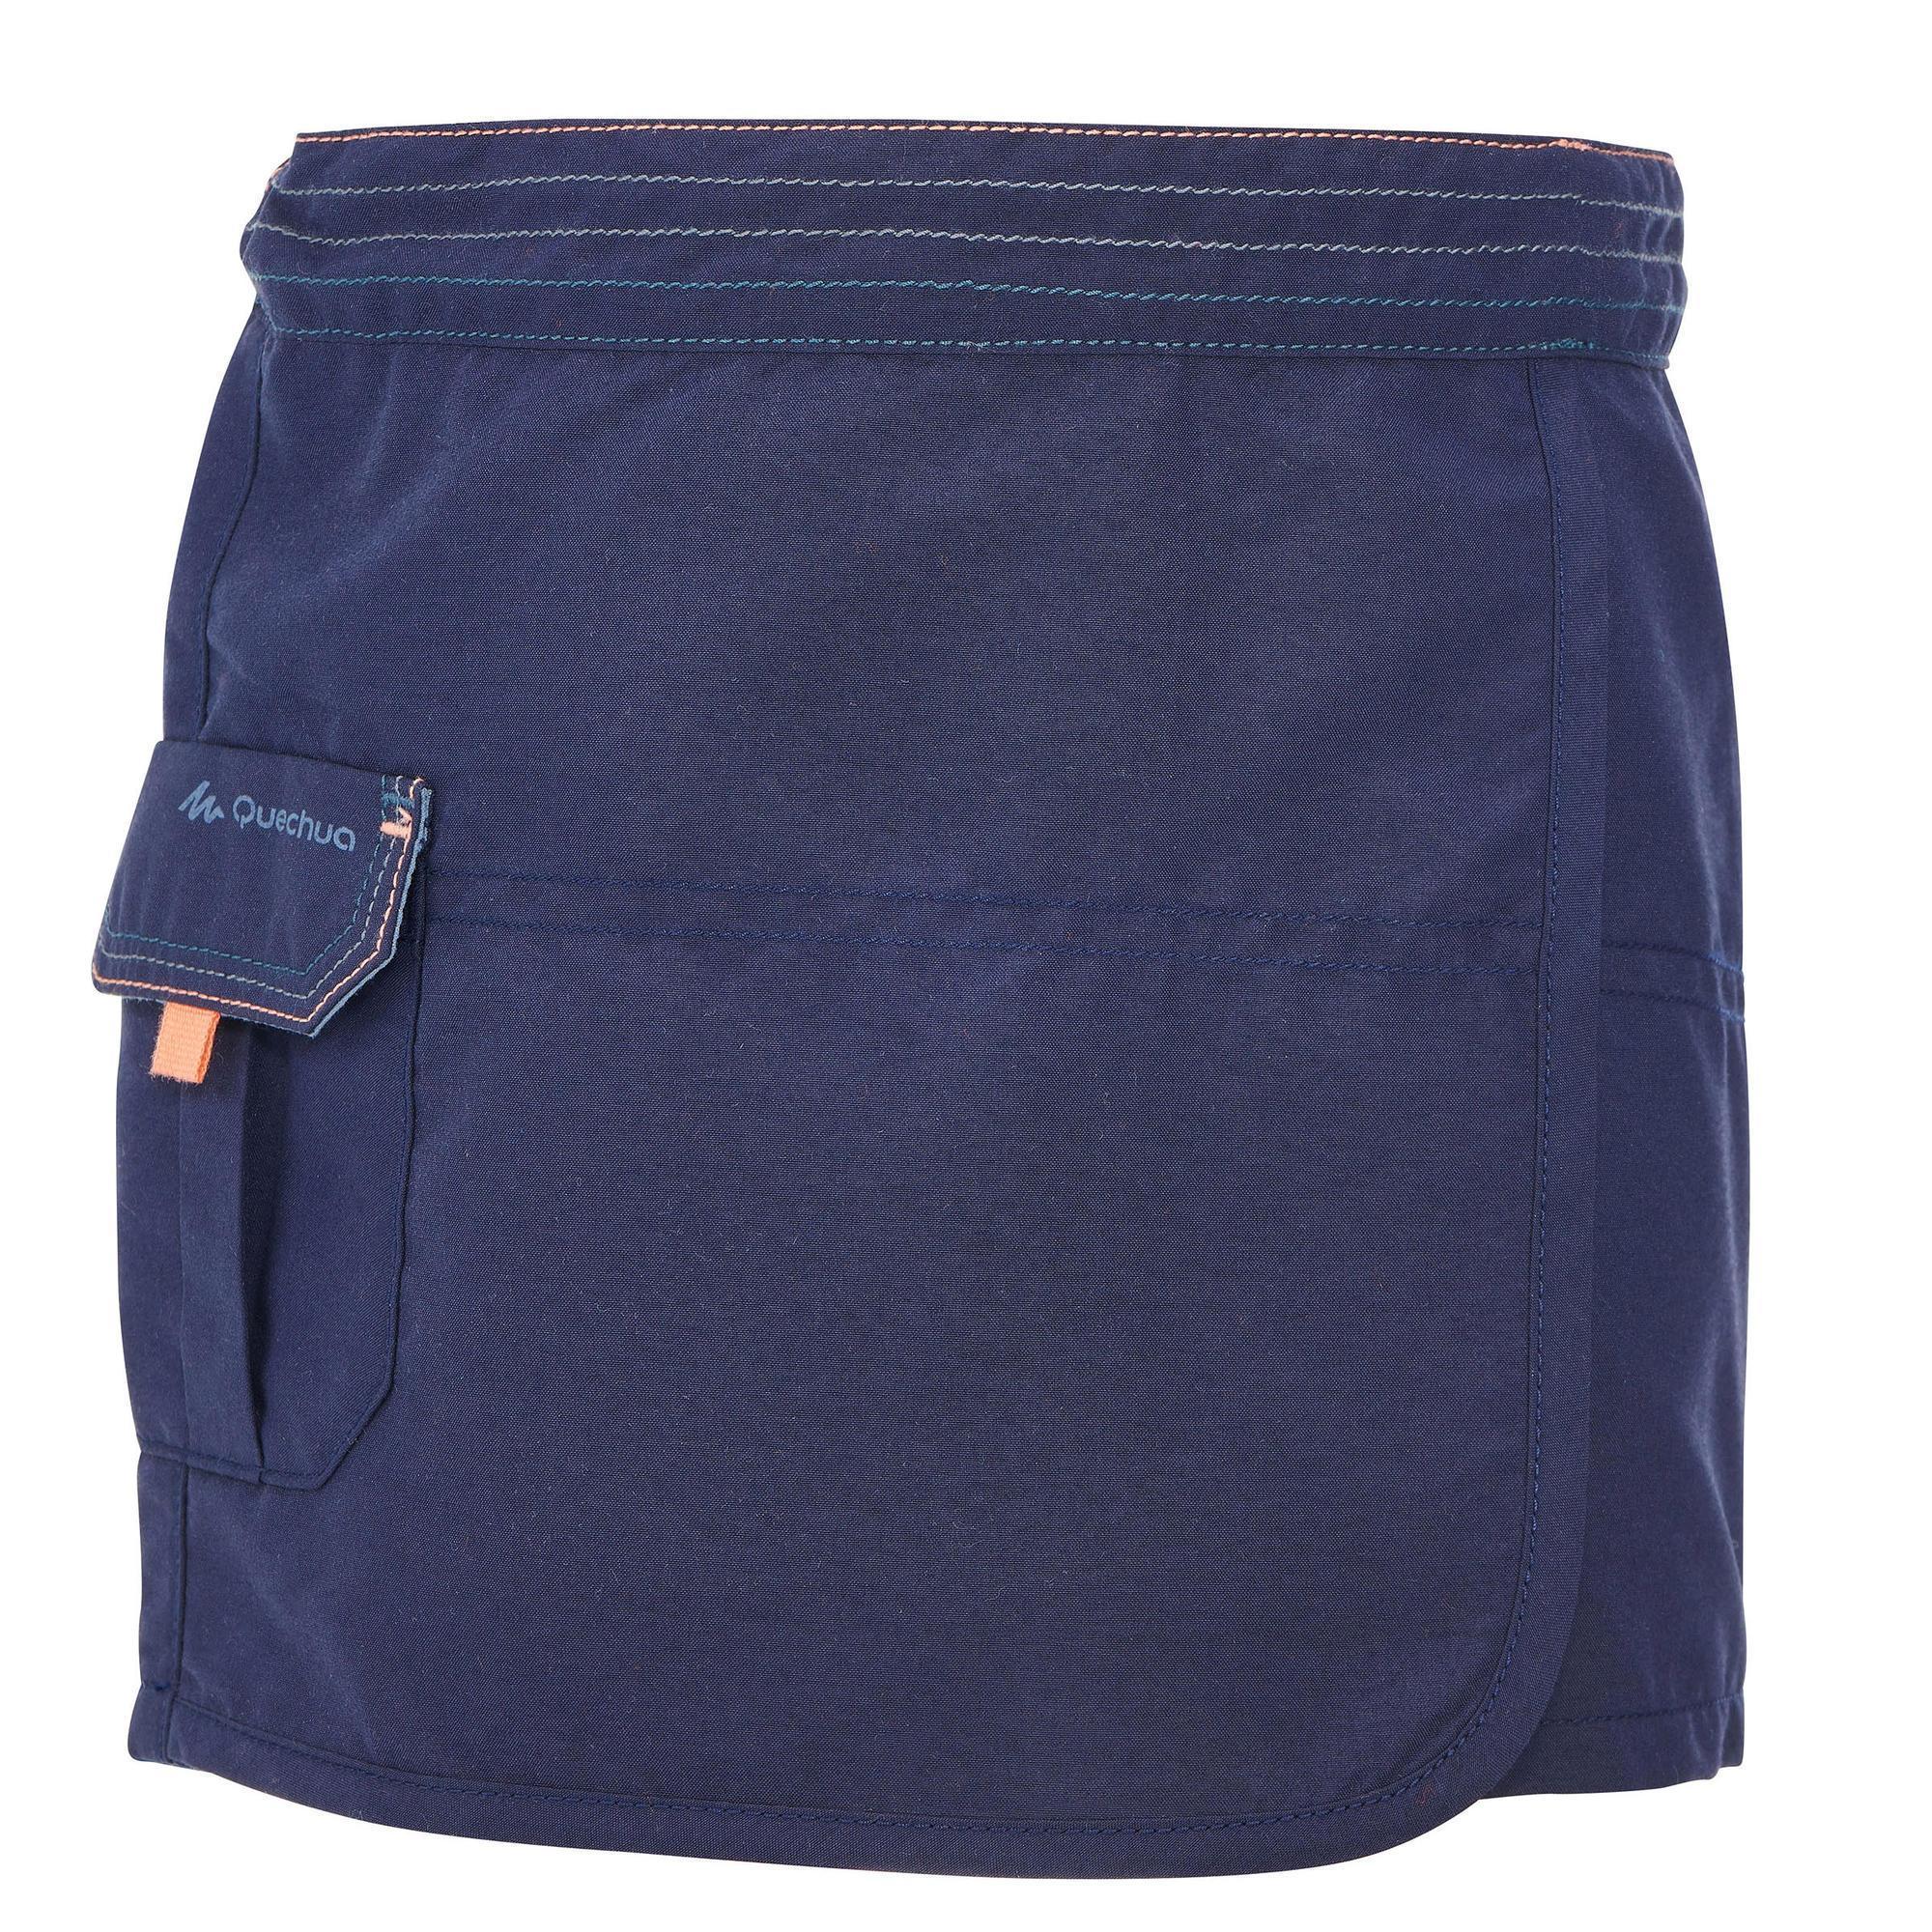 b8e9666ec Comprar Faldas deportivas para niñas de 5 a 14 años online| Decathlon